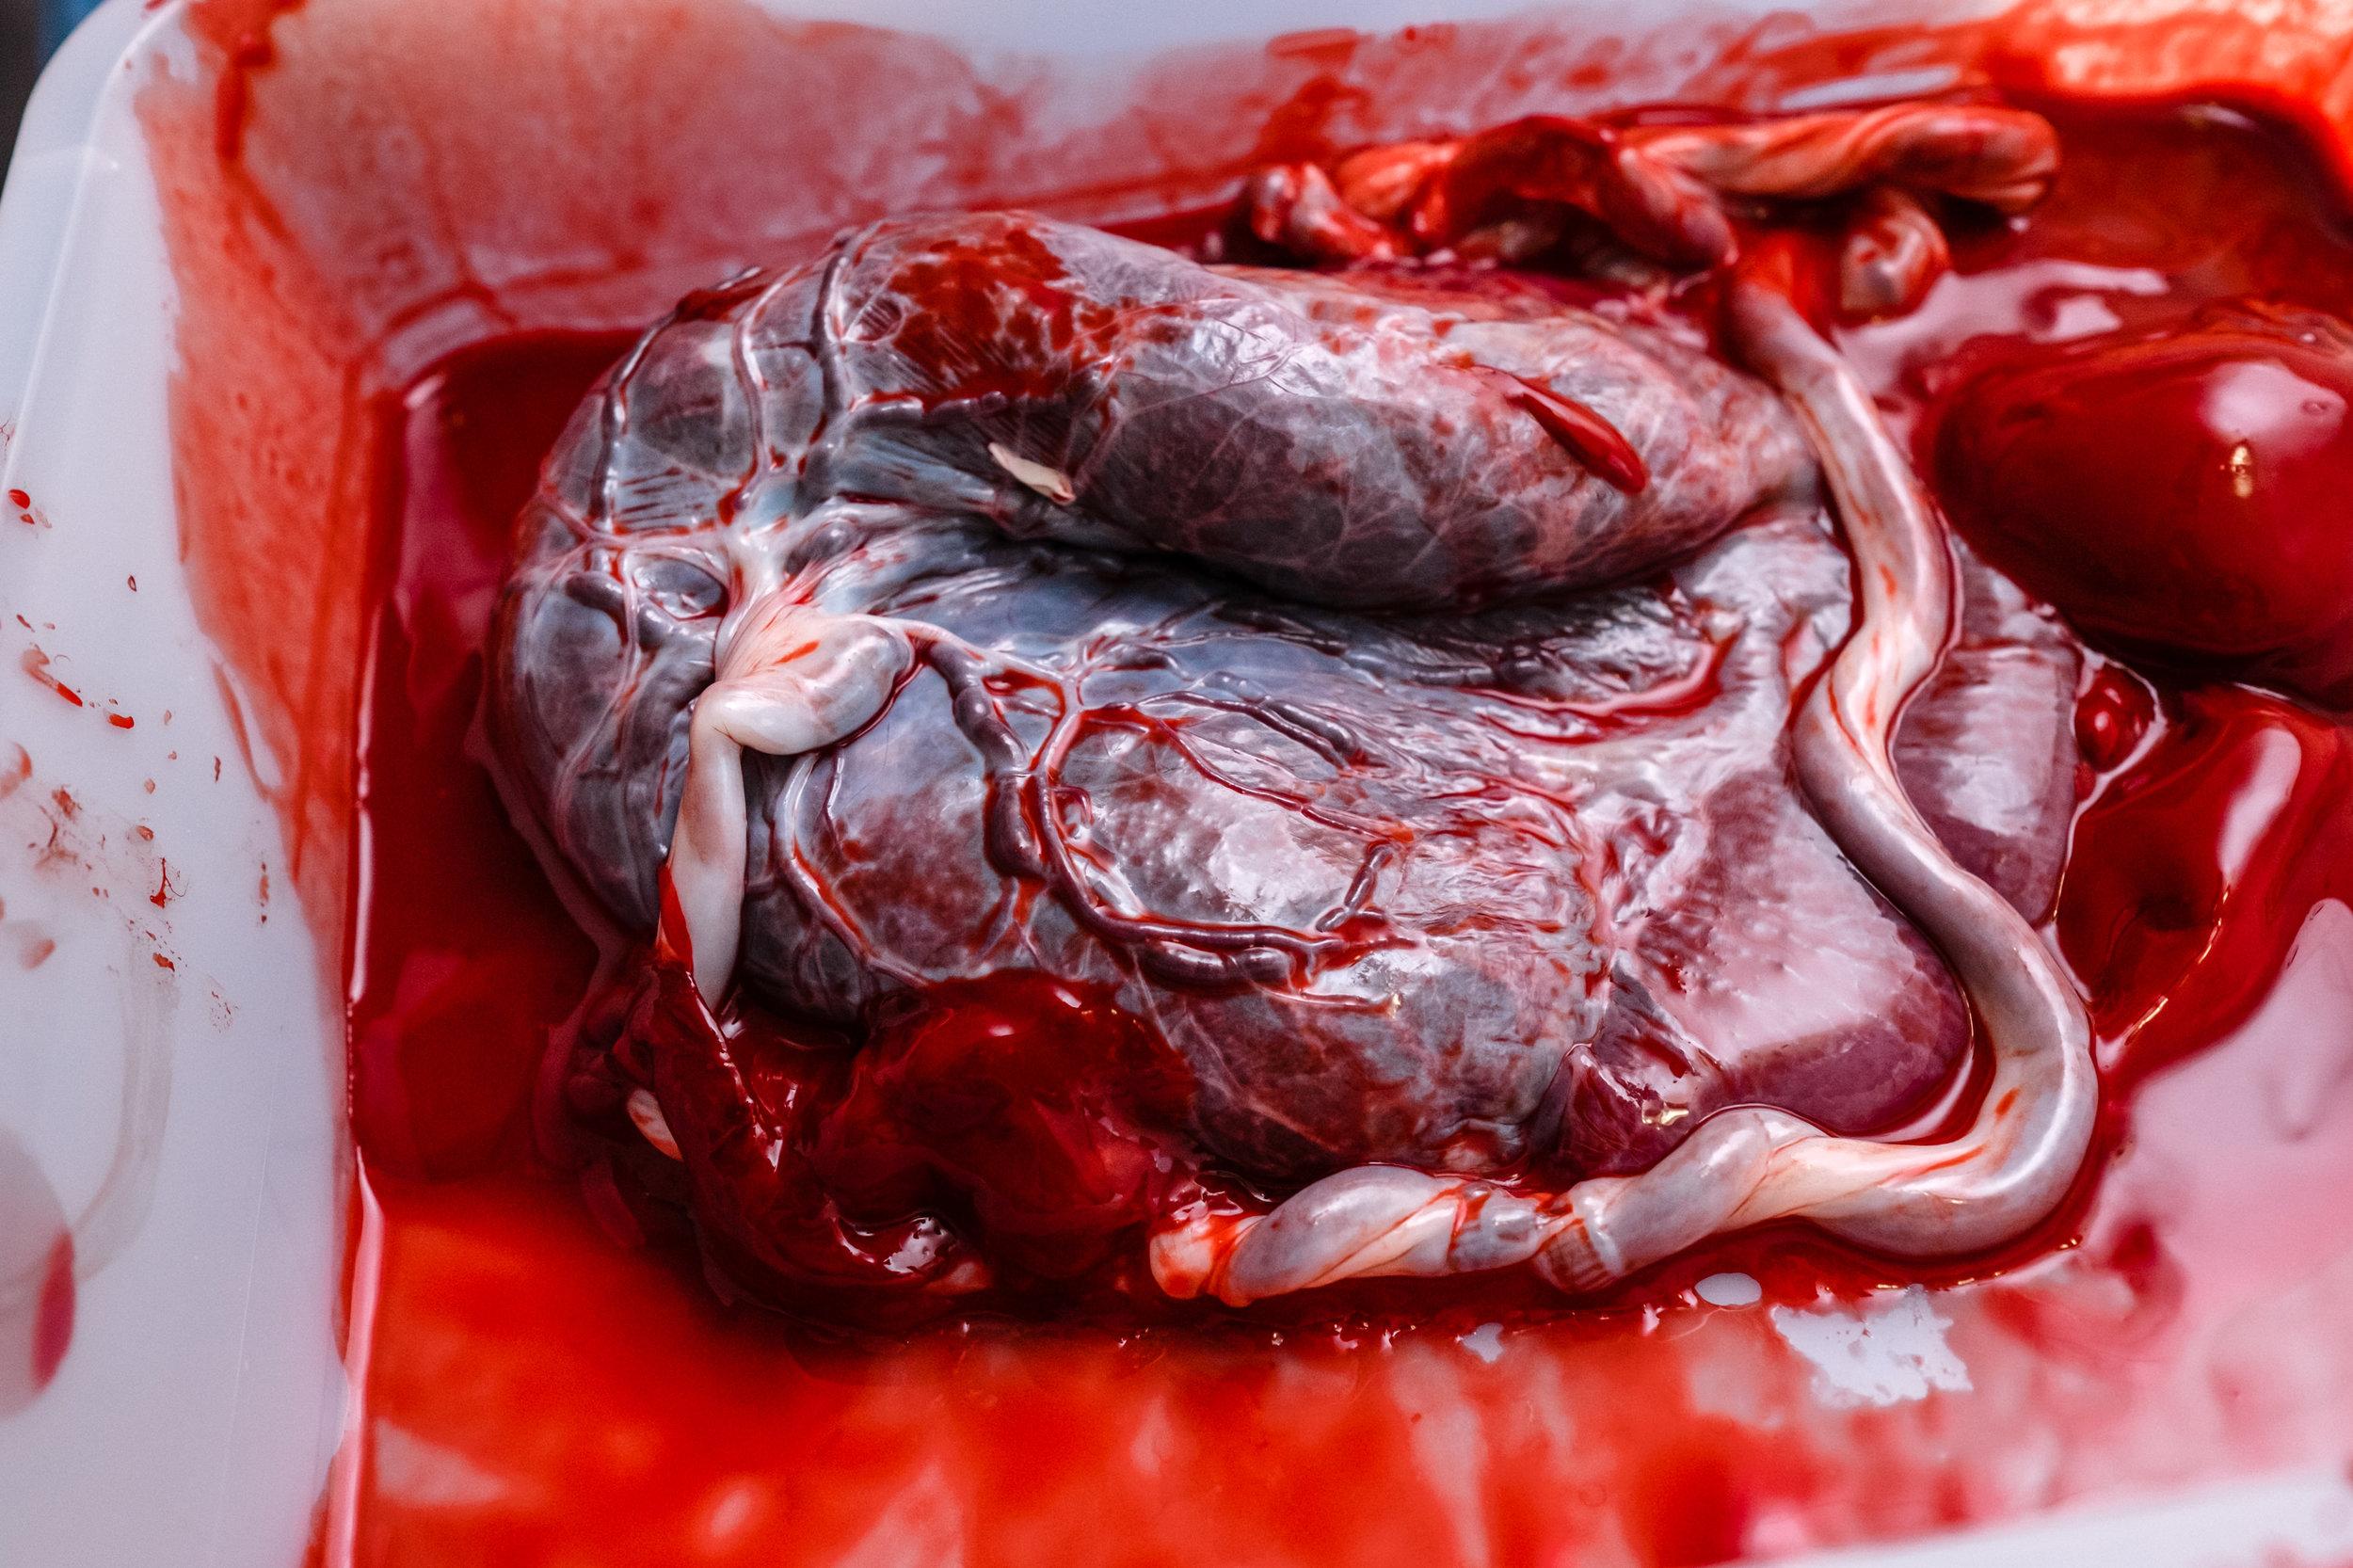 placenta-birth-photographer-vancouver-veins-umbilical-cord